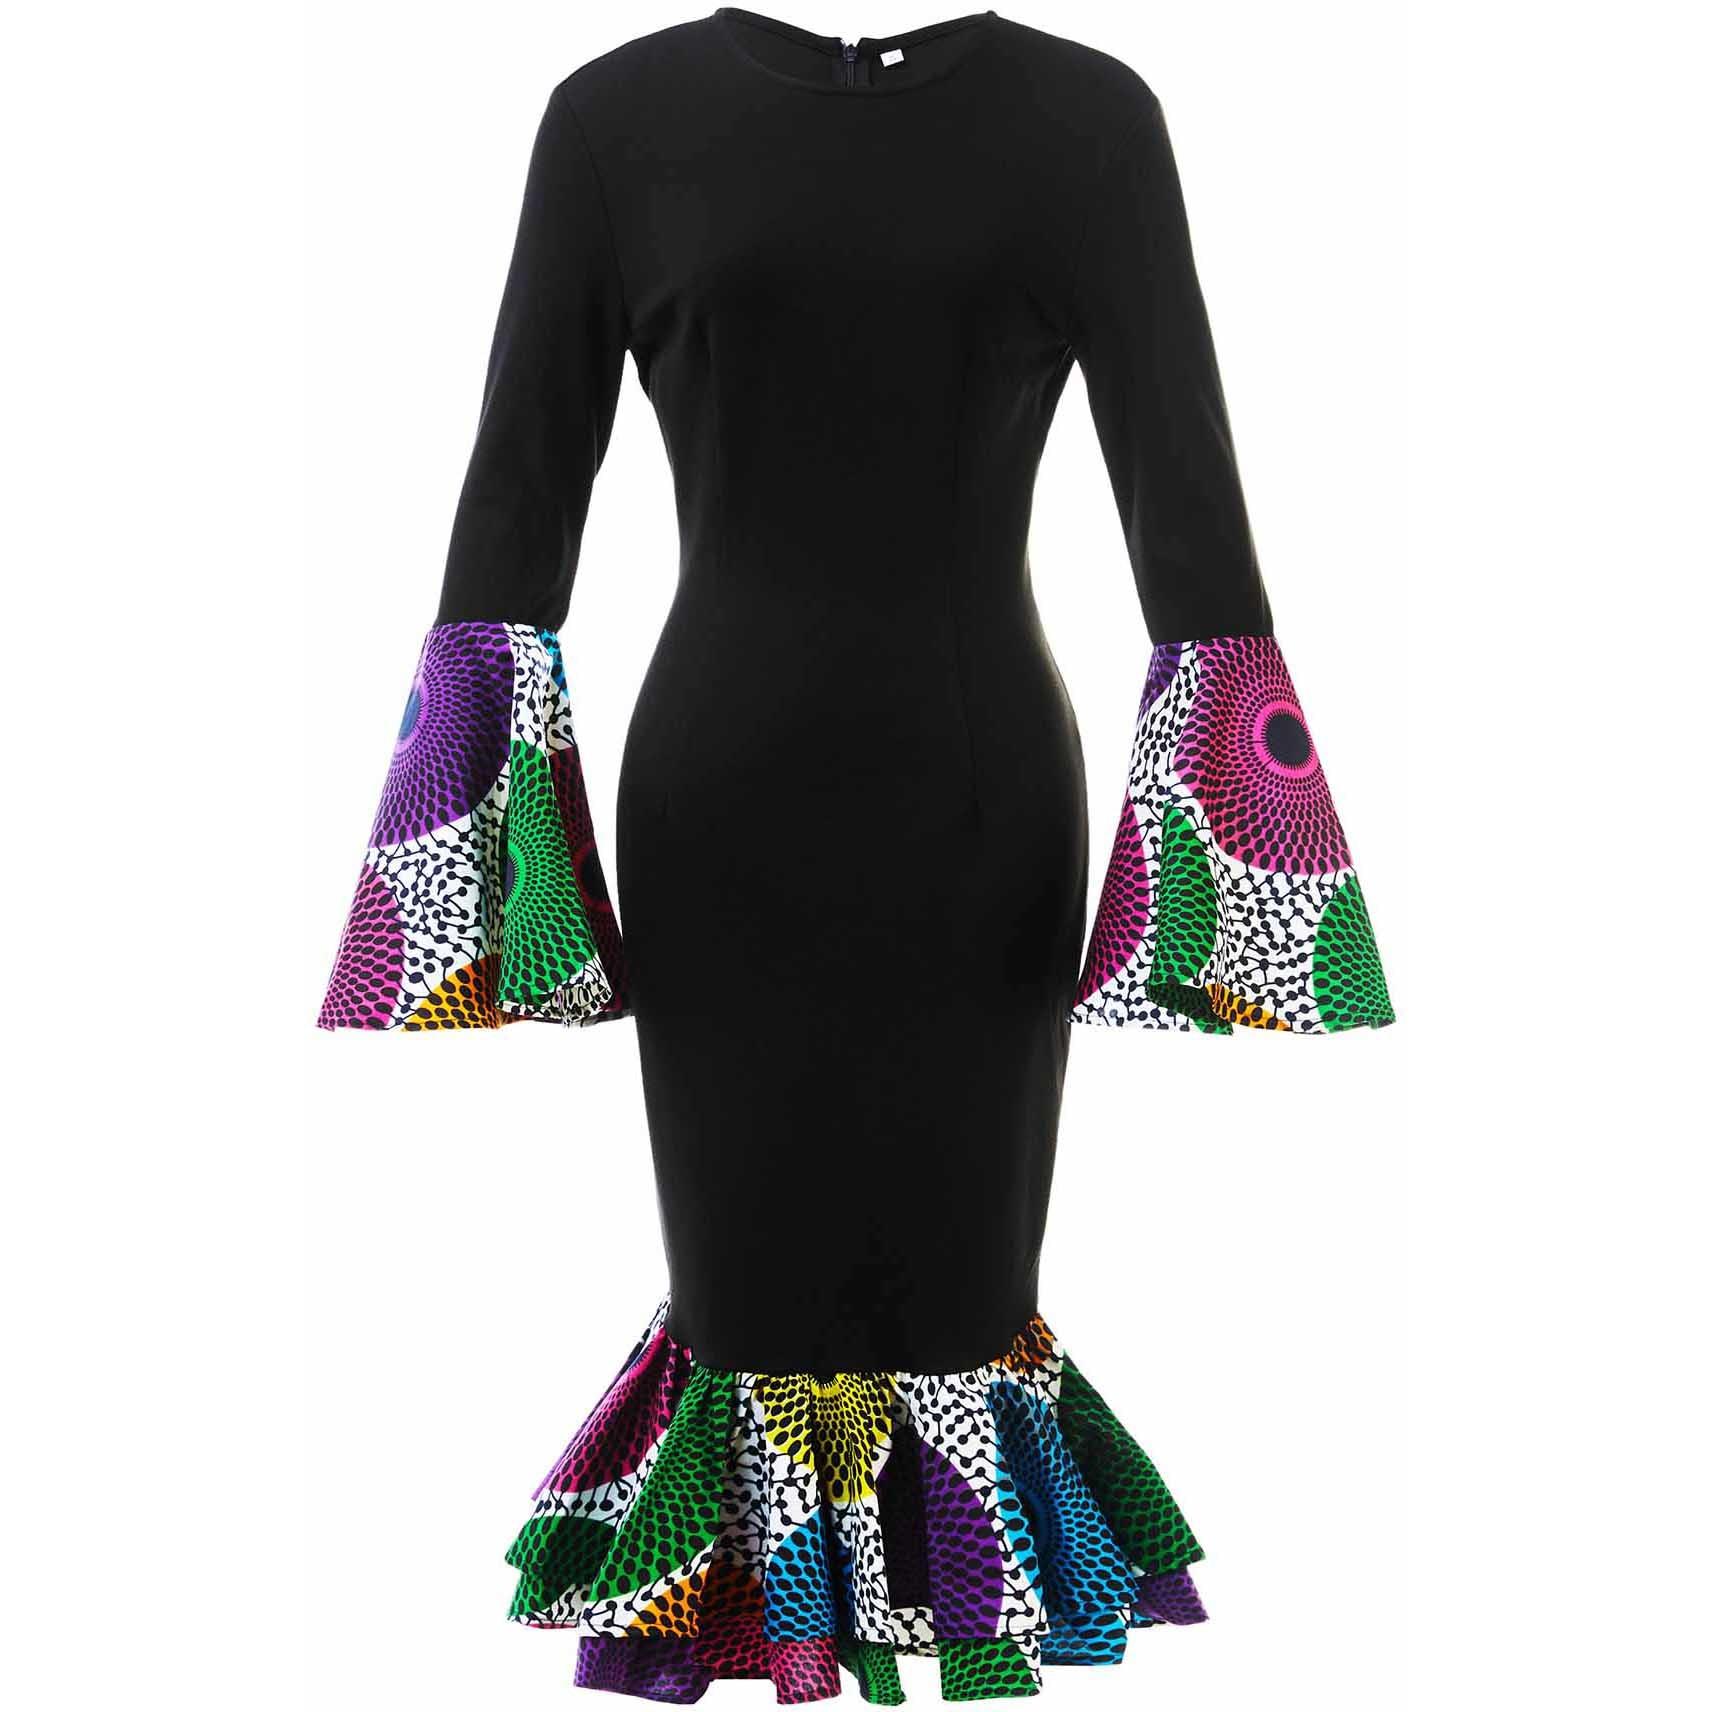 Shenbolen African Dresses For Women Cotton Material African Women Clothing African Traditional Dresses Ankara Dresses